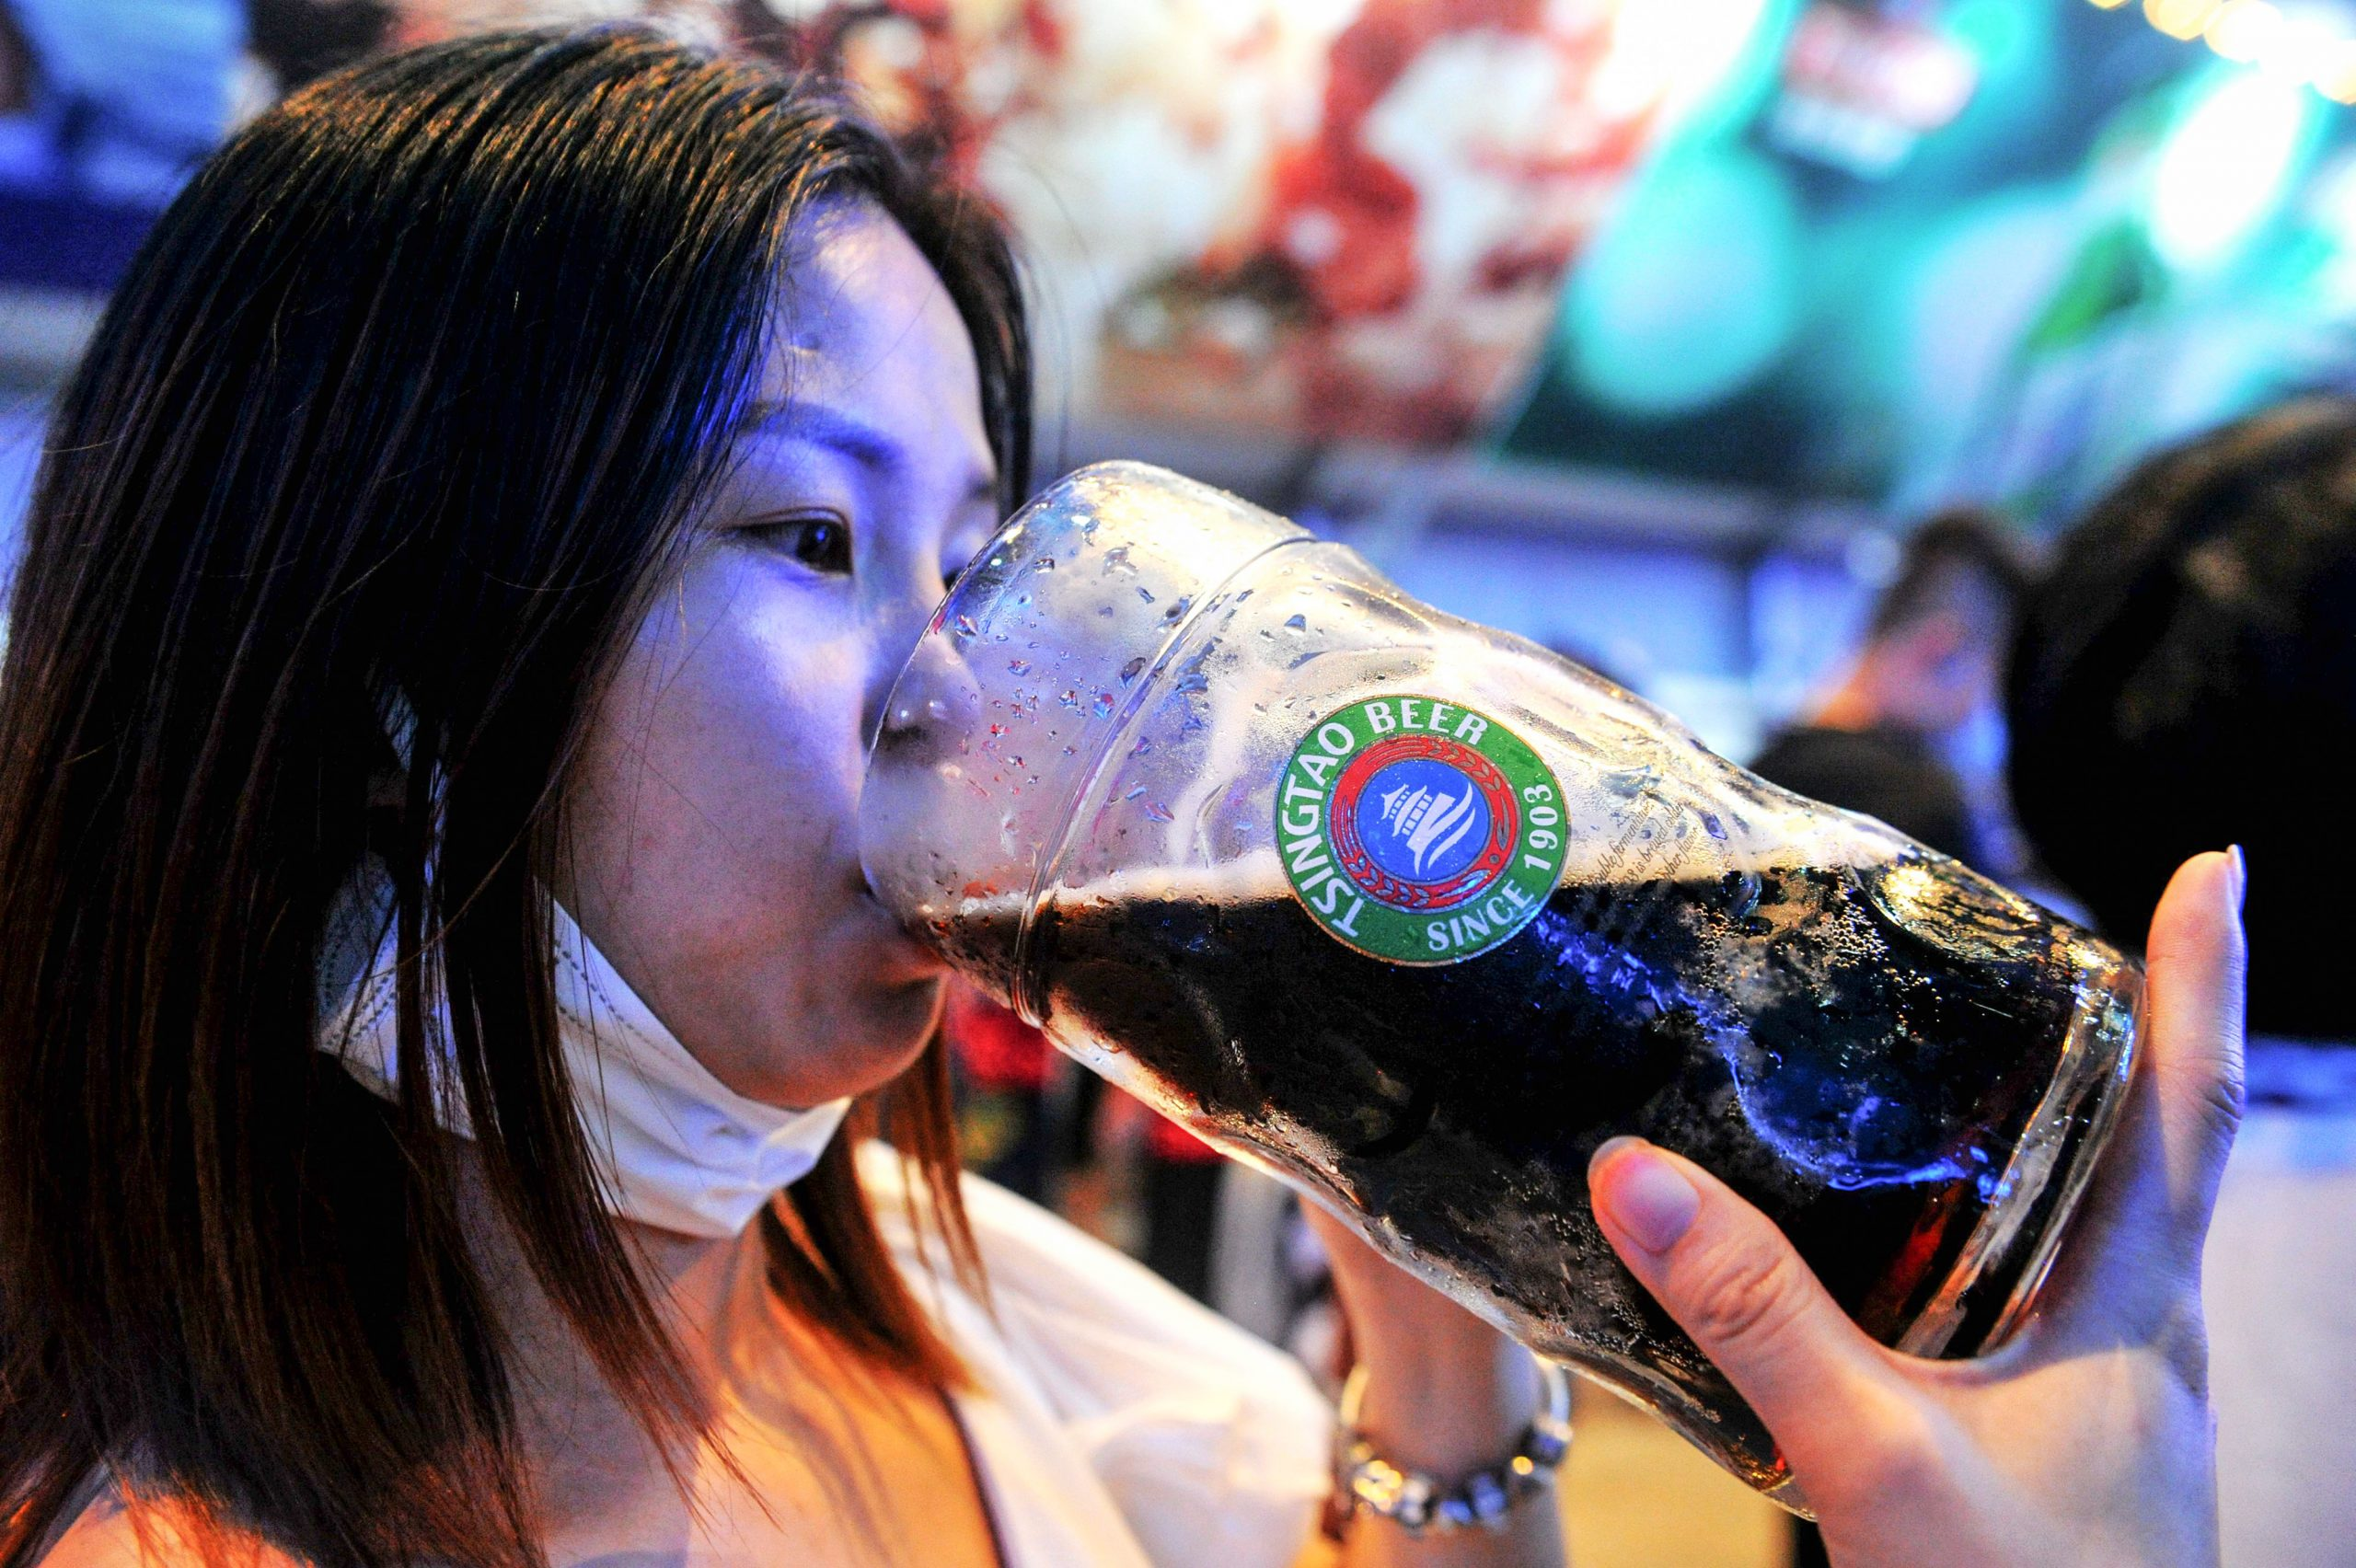 China festival de la cerveza